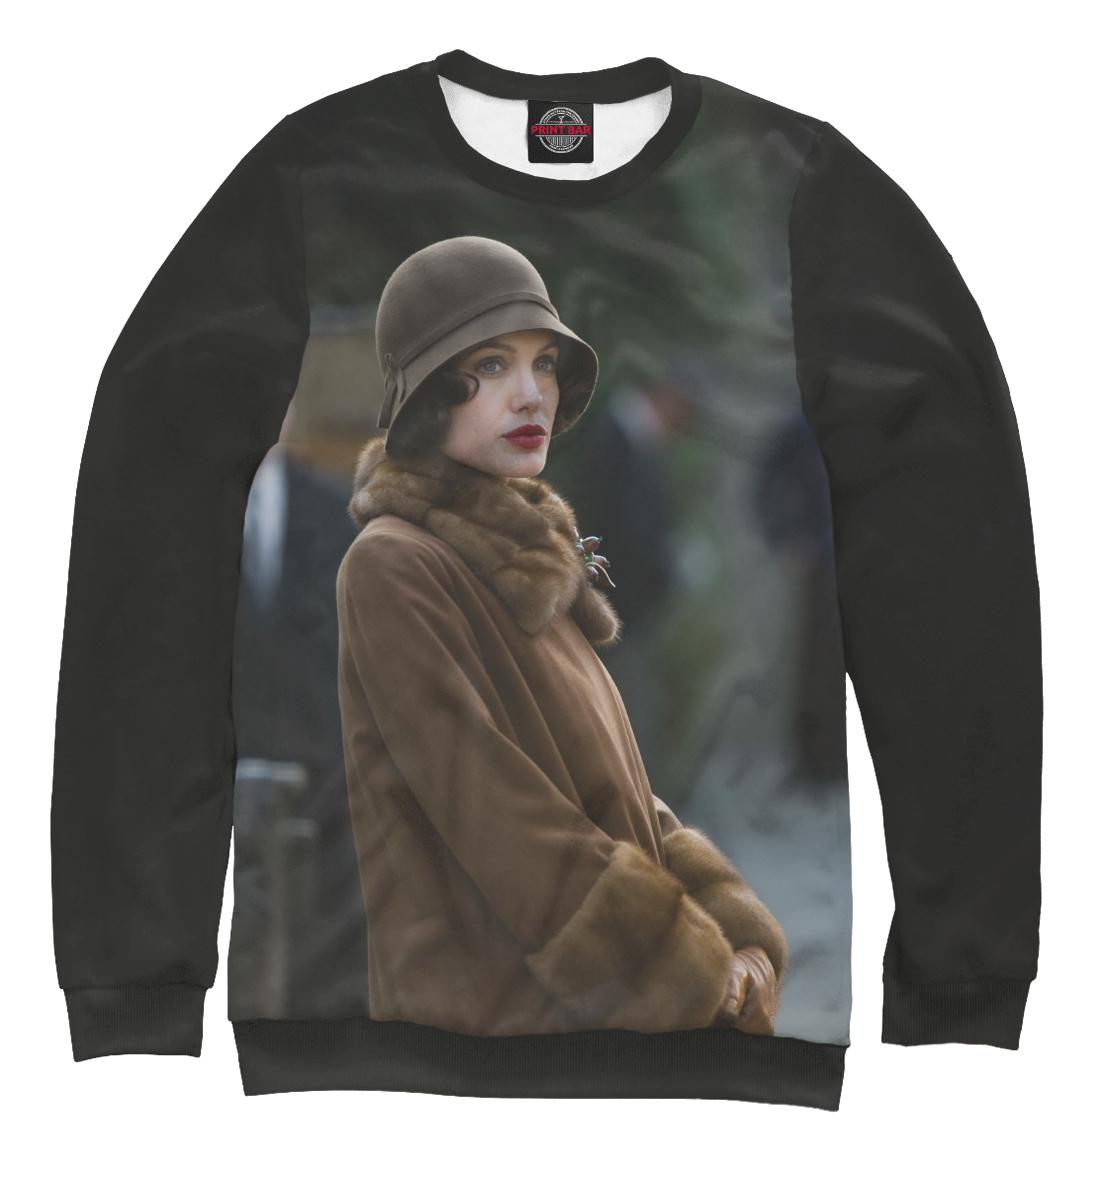 Купить Подмена — Анджелина Джоли, Printbar, Свитшоты, KNO-767007-swi-1